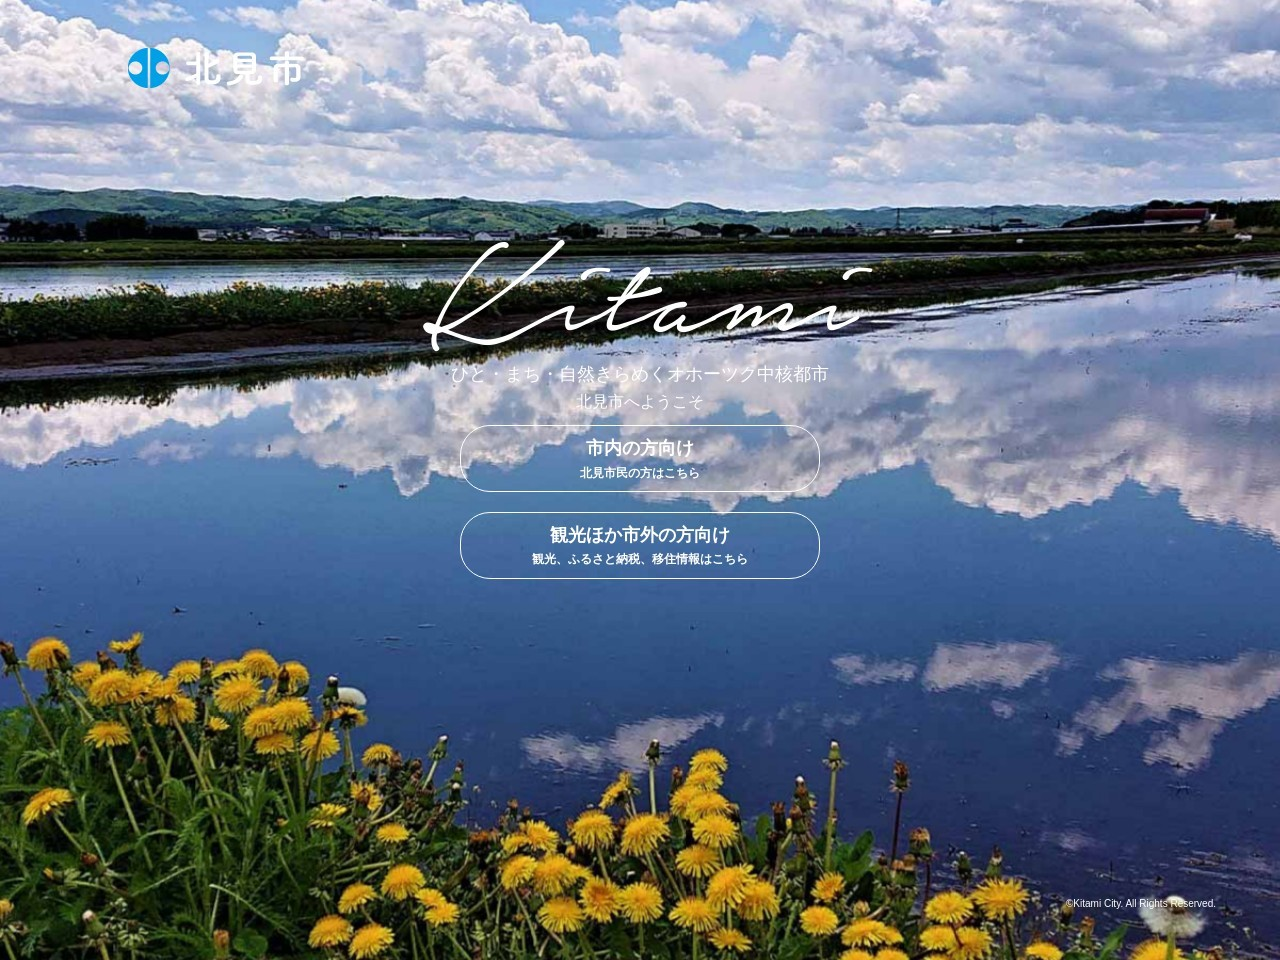 http://www.city.kitami.lg.jp/docs/2018052200024/